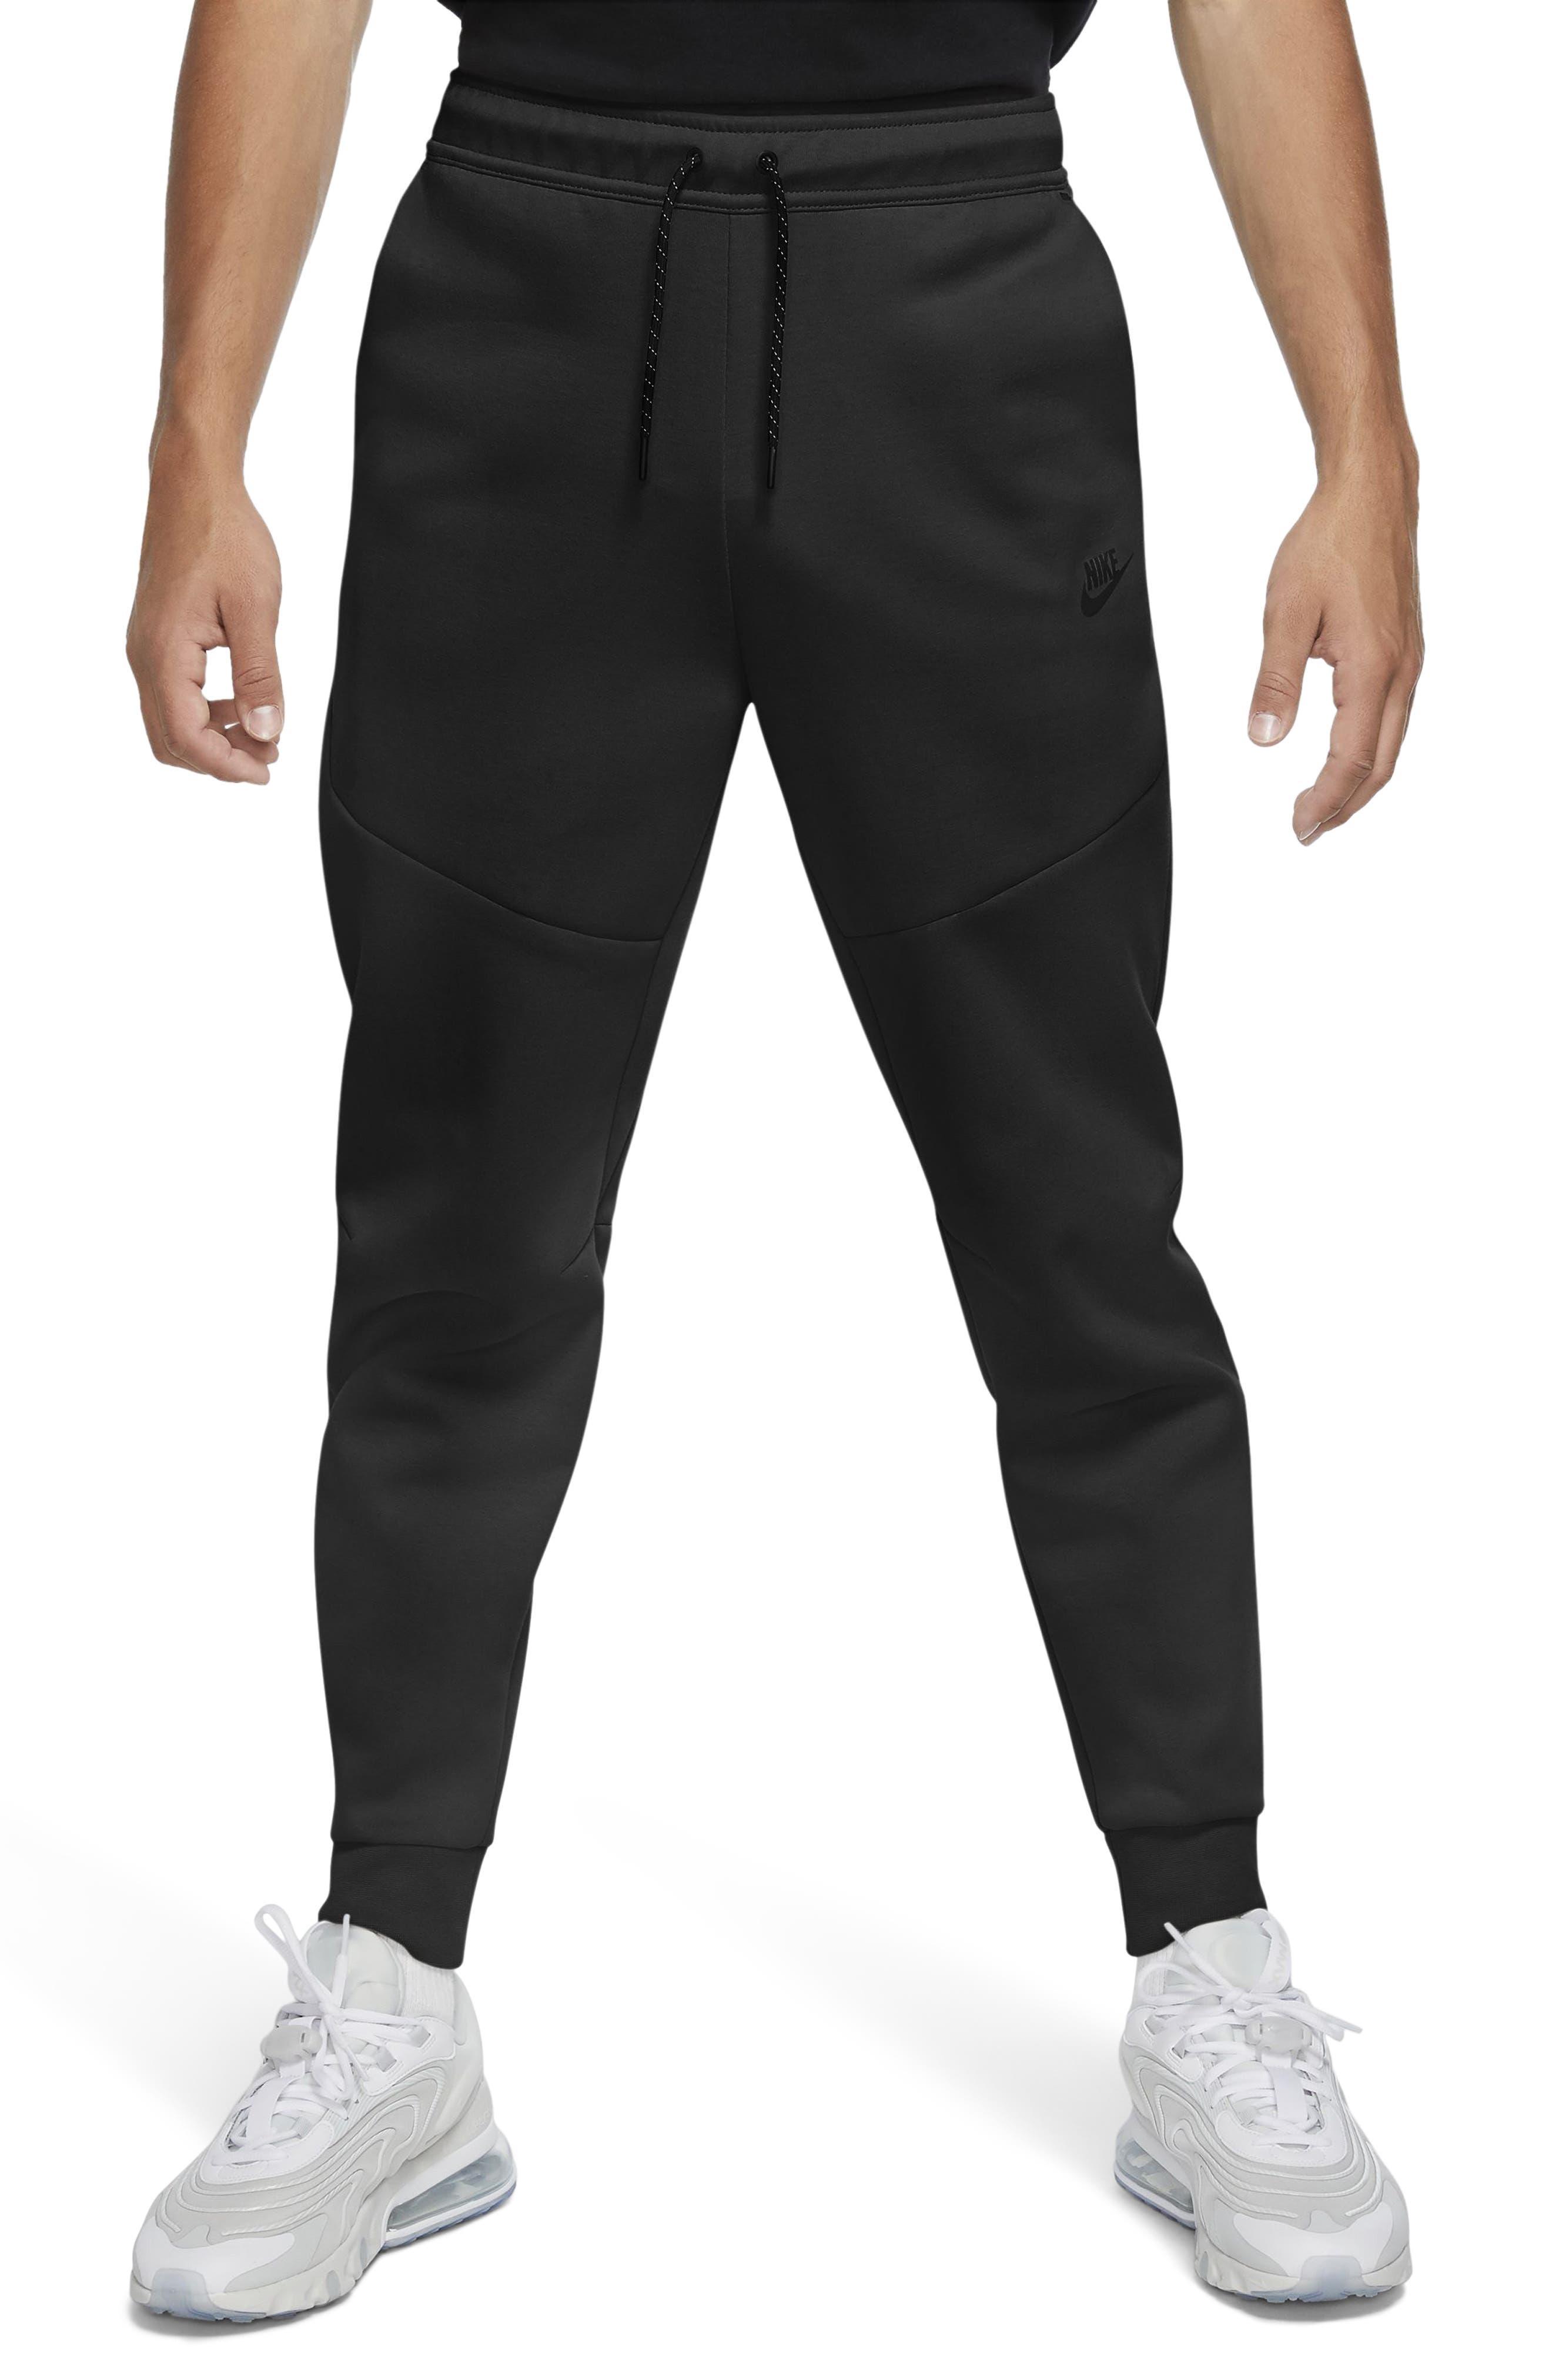 Men's Nike Men's Tech Fleece Jogger Sweatpants